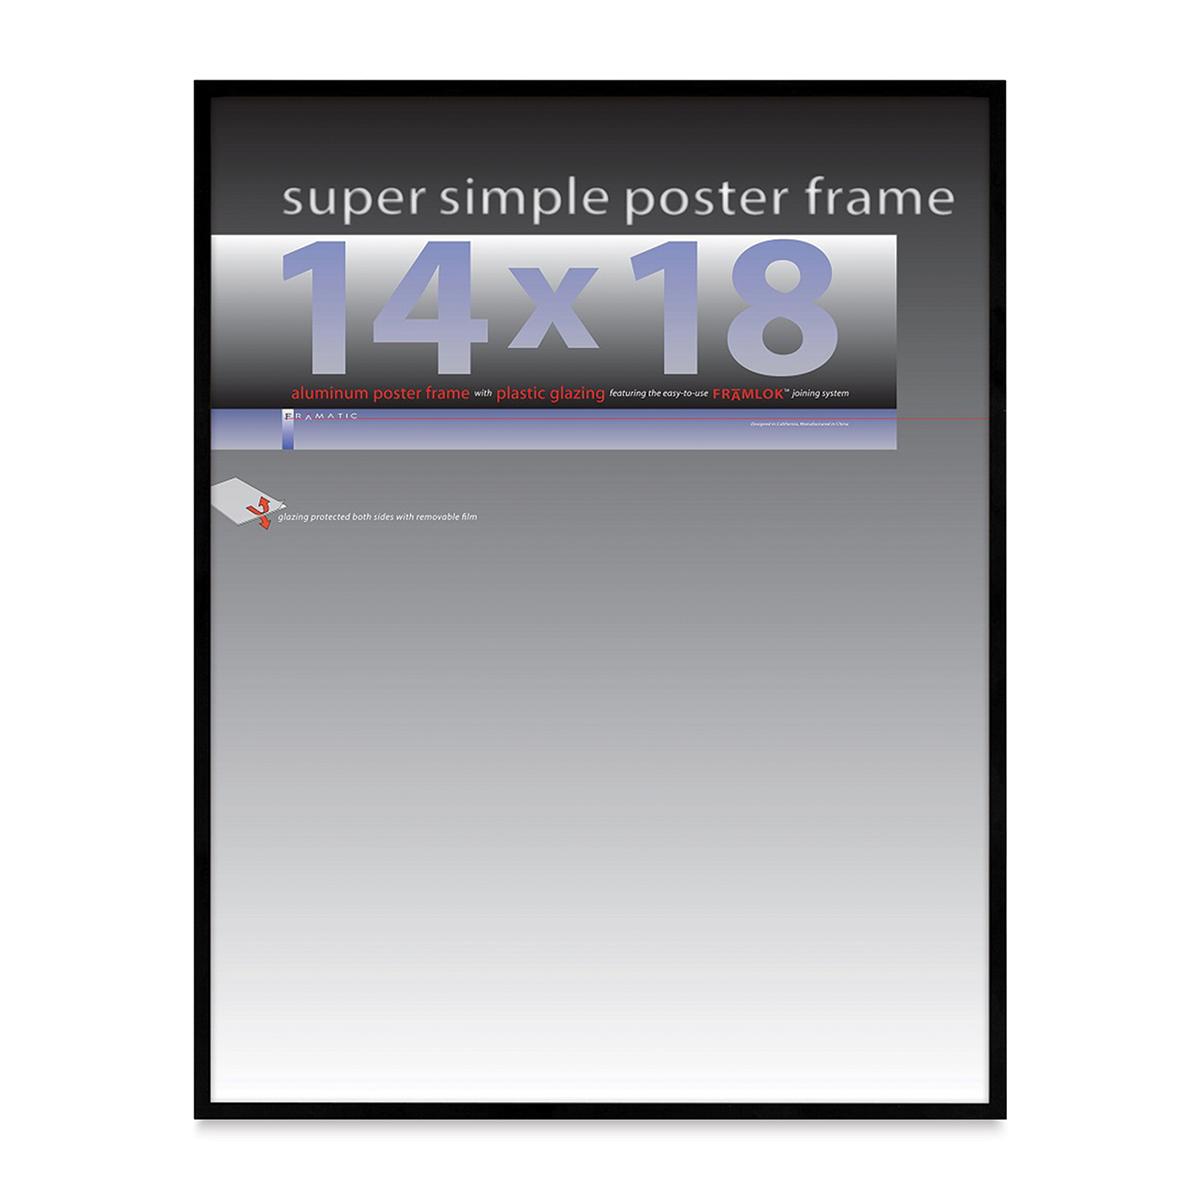 Framatic Super Simple Poster Frame - Black, 14 x 18